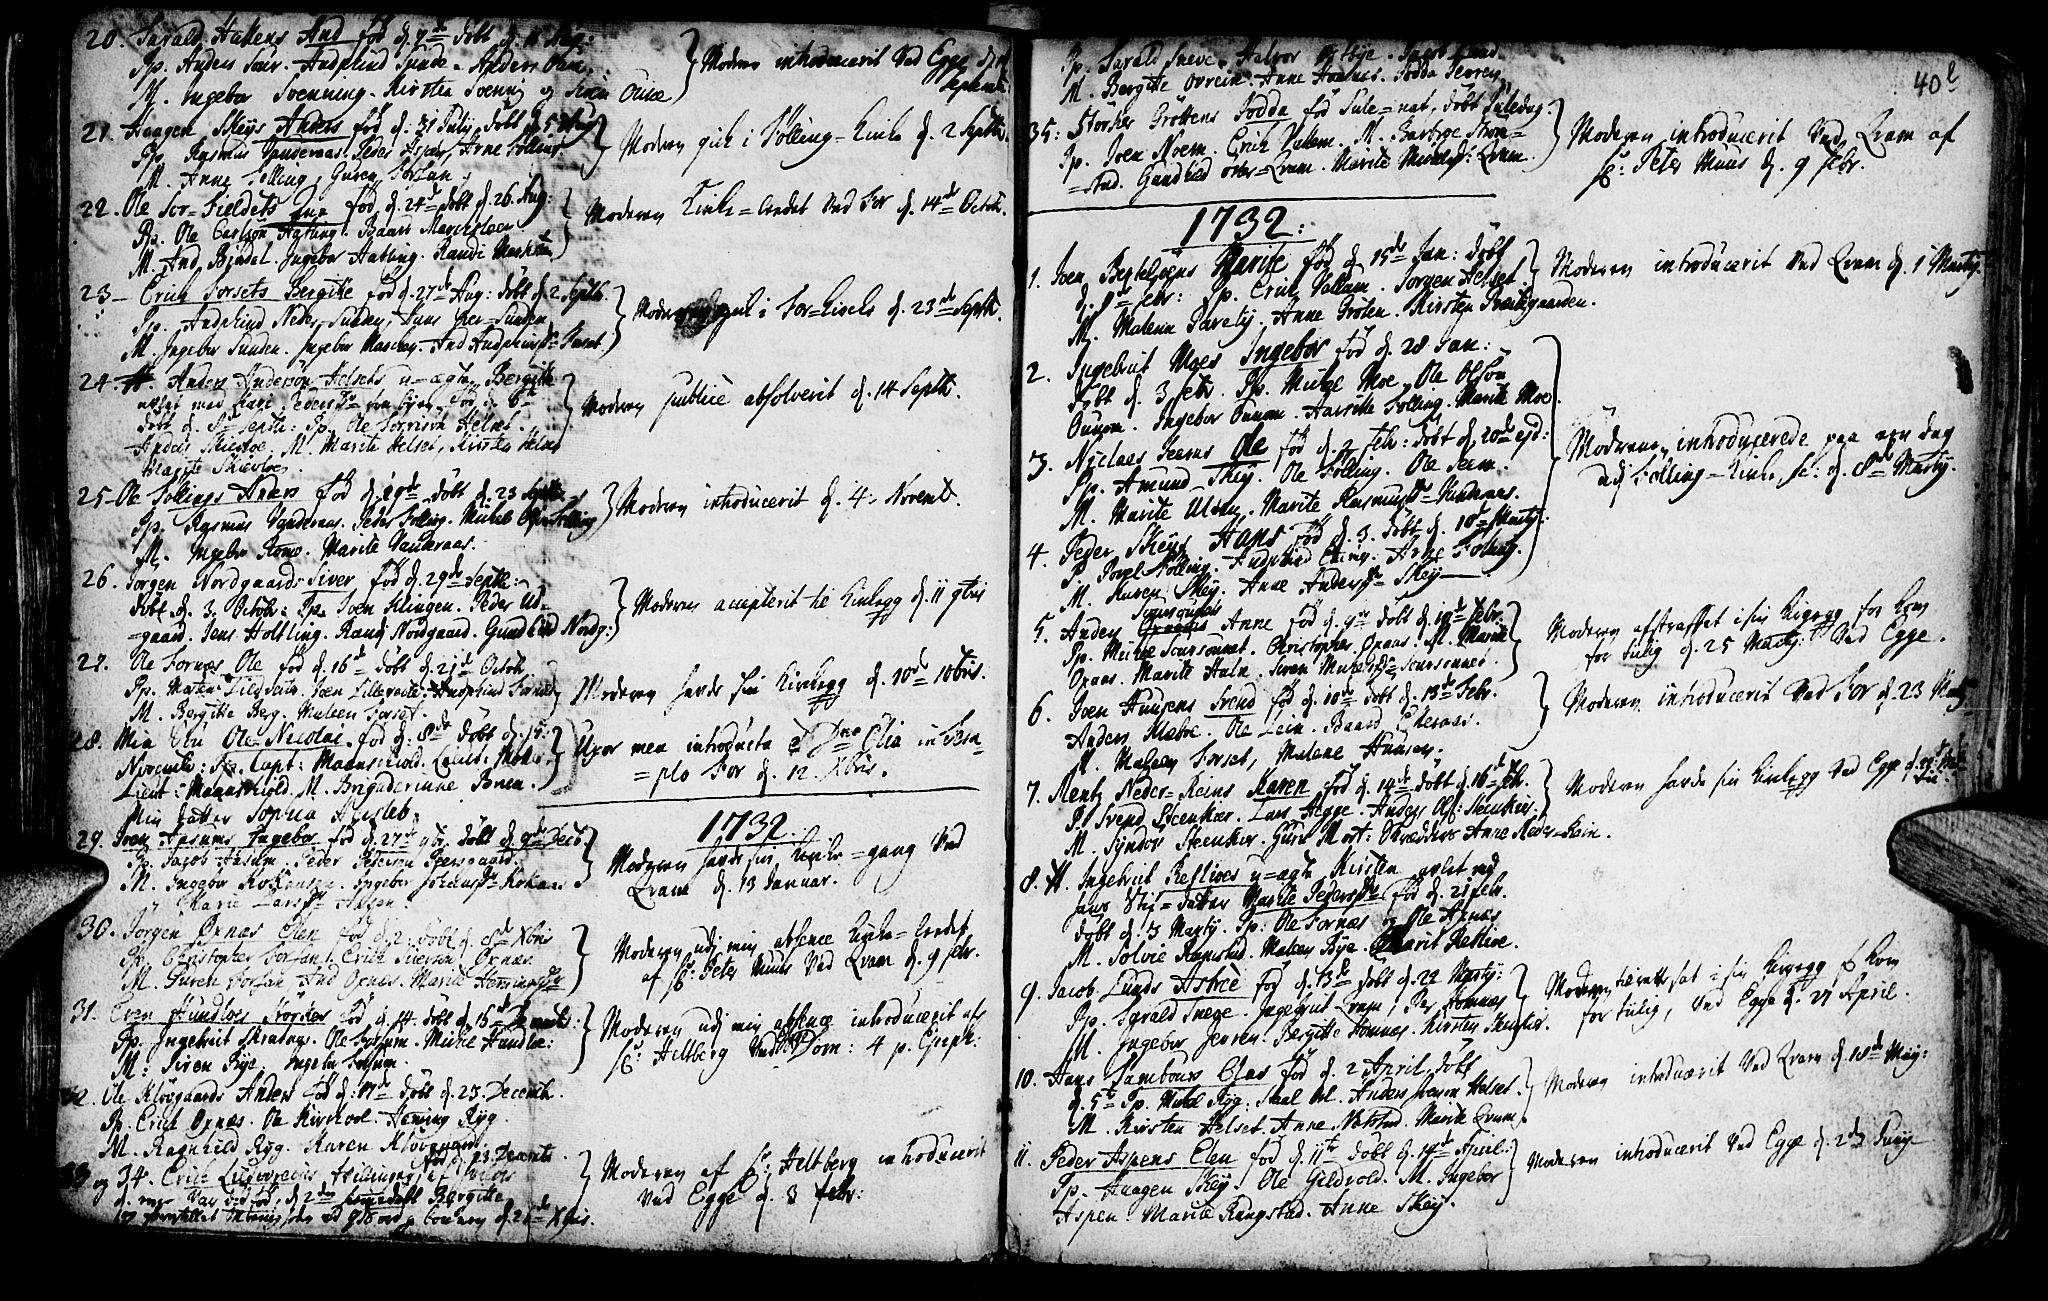 SAT, Ministerialprotokoller, klokkerbøker og fødselsregistre - Nord-Trøndelag, 746/L0439: Ministerialbok nr. 746A01, 1688-1759, s. 40l